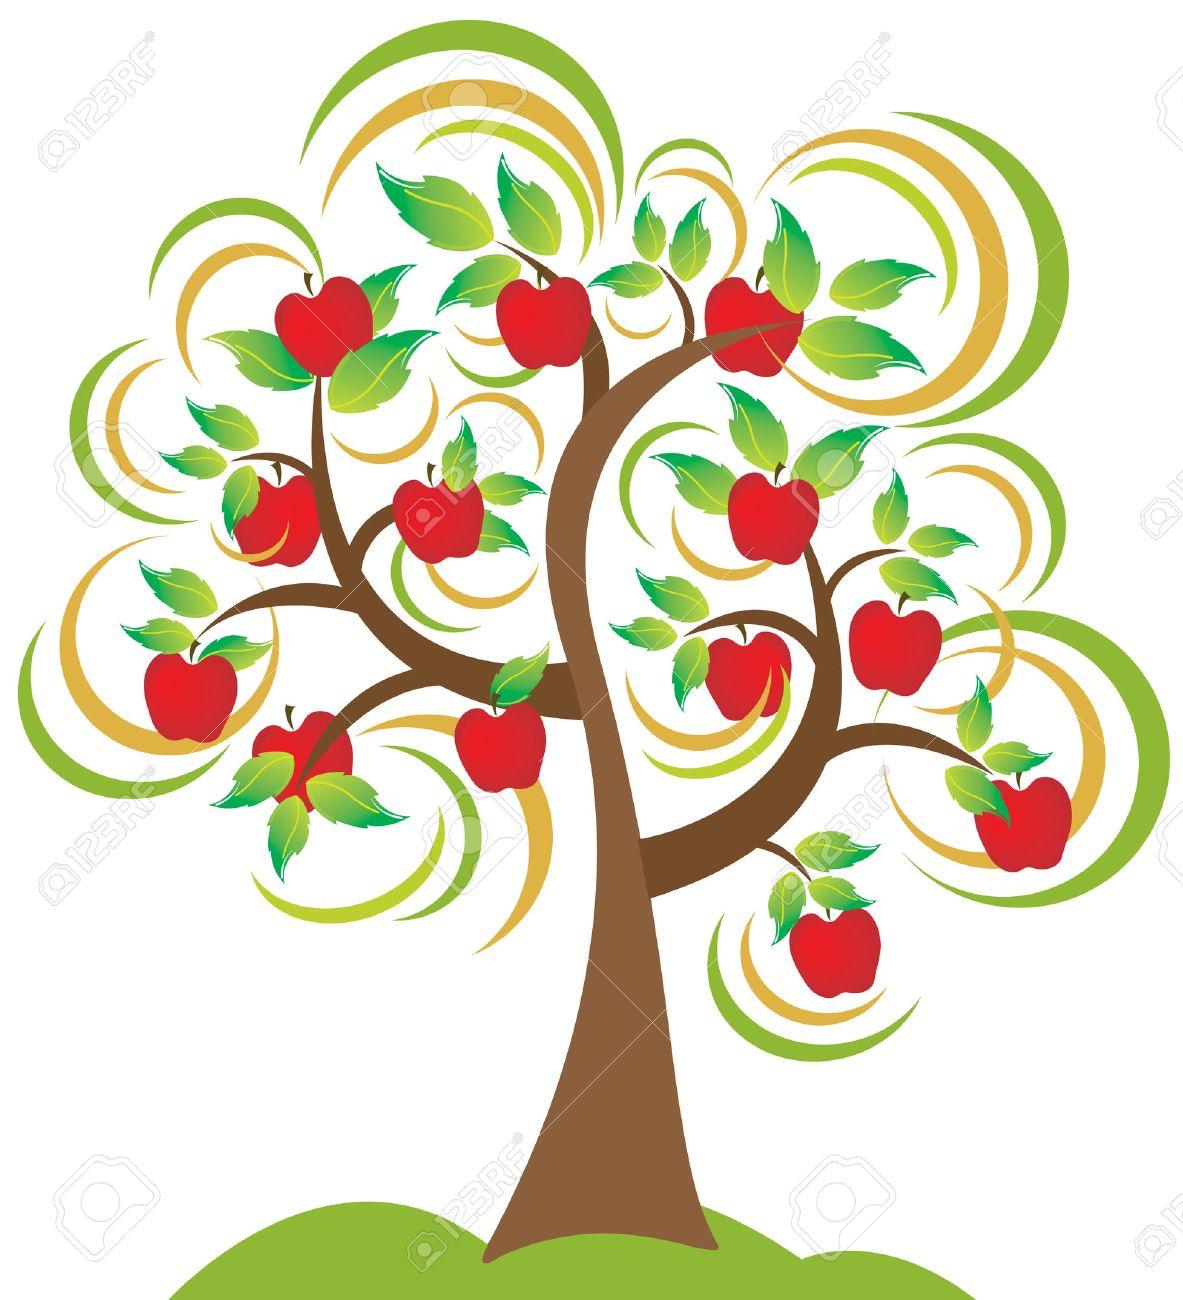 Apple Tree a Beautiful Apple